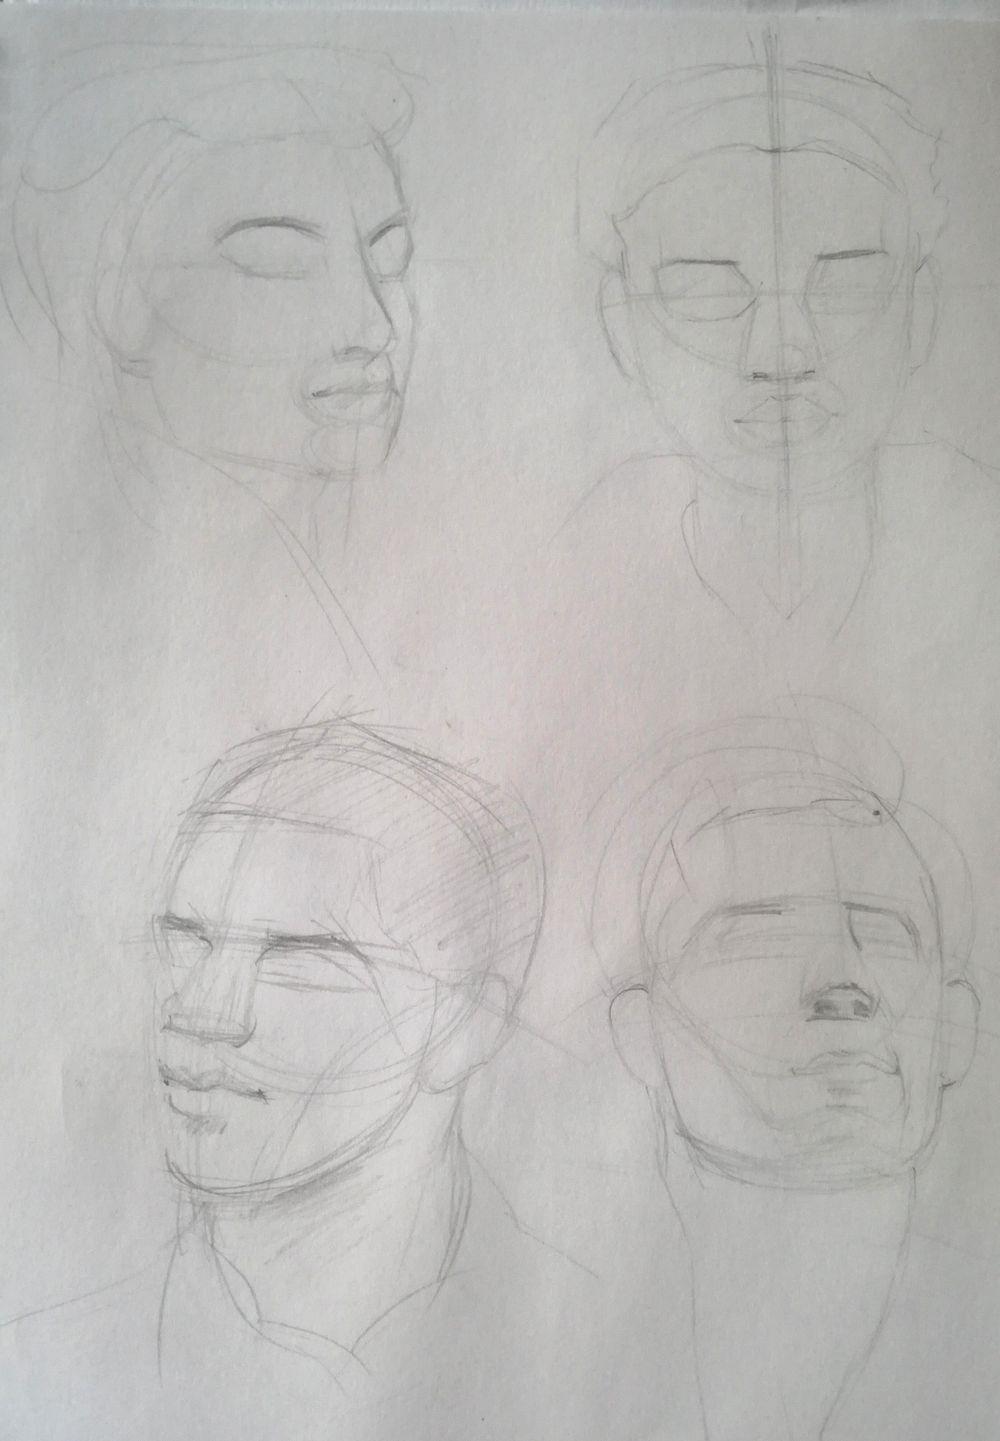 Portraits - image 17 - student project